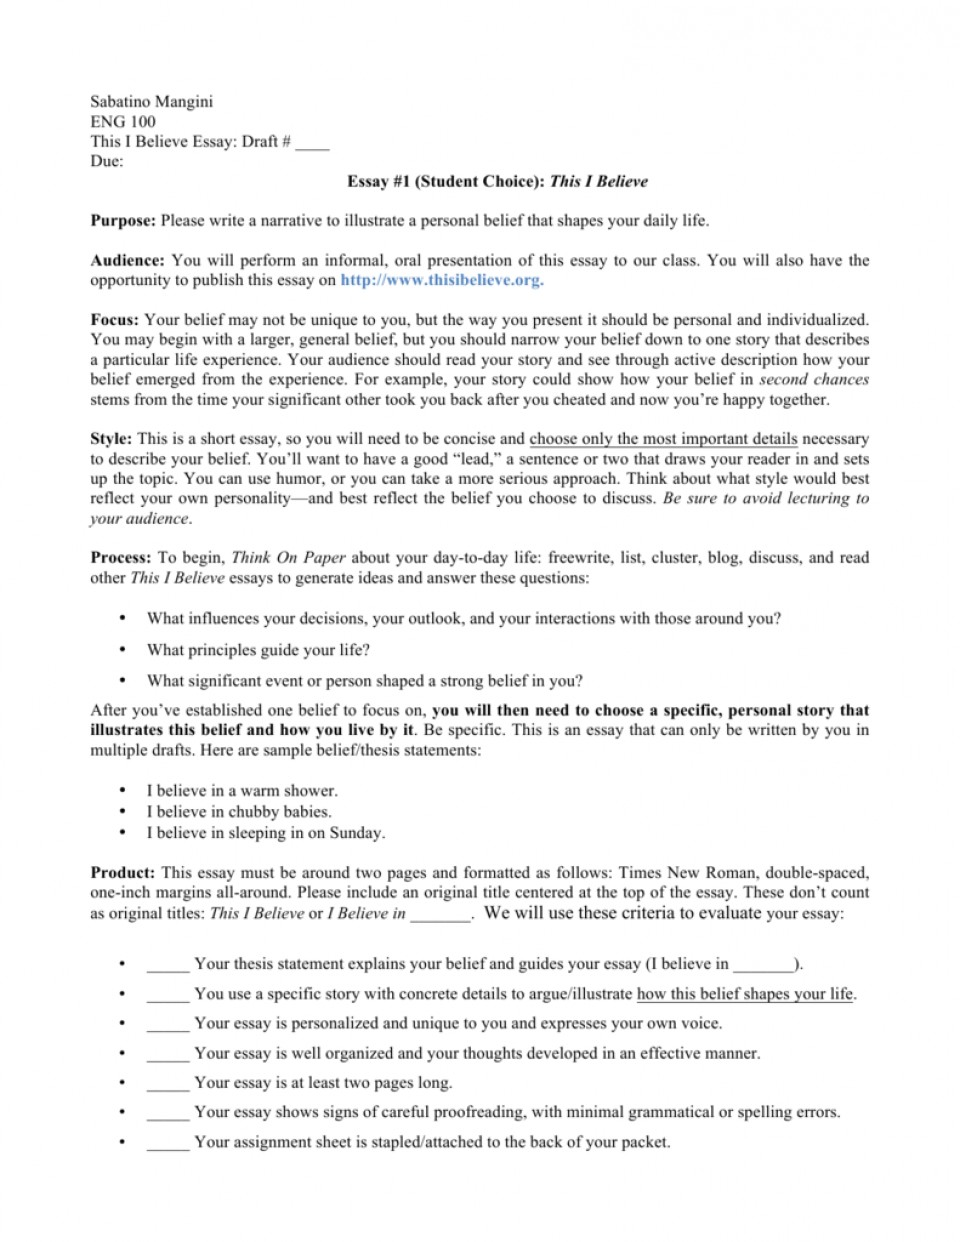 007 008807227 1 I Belive Essays Essay Surprising Believe About Sports Ideas 960